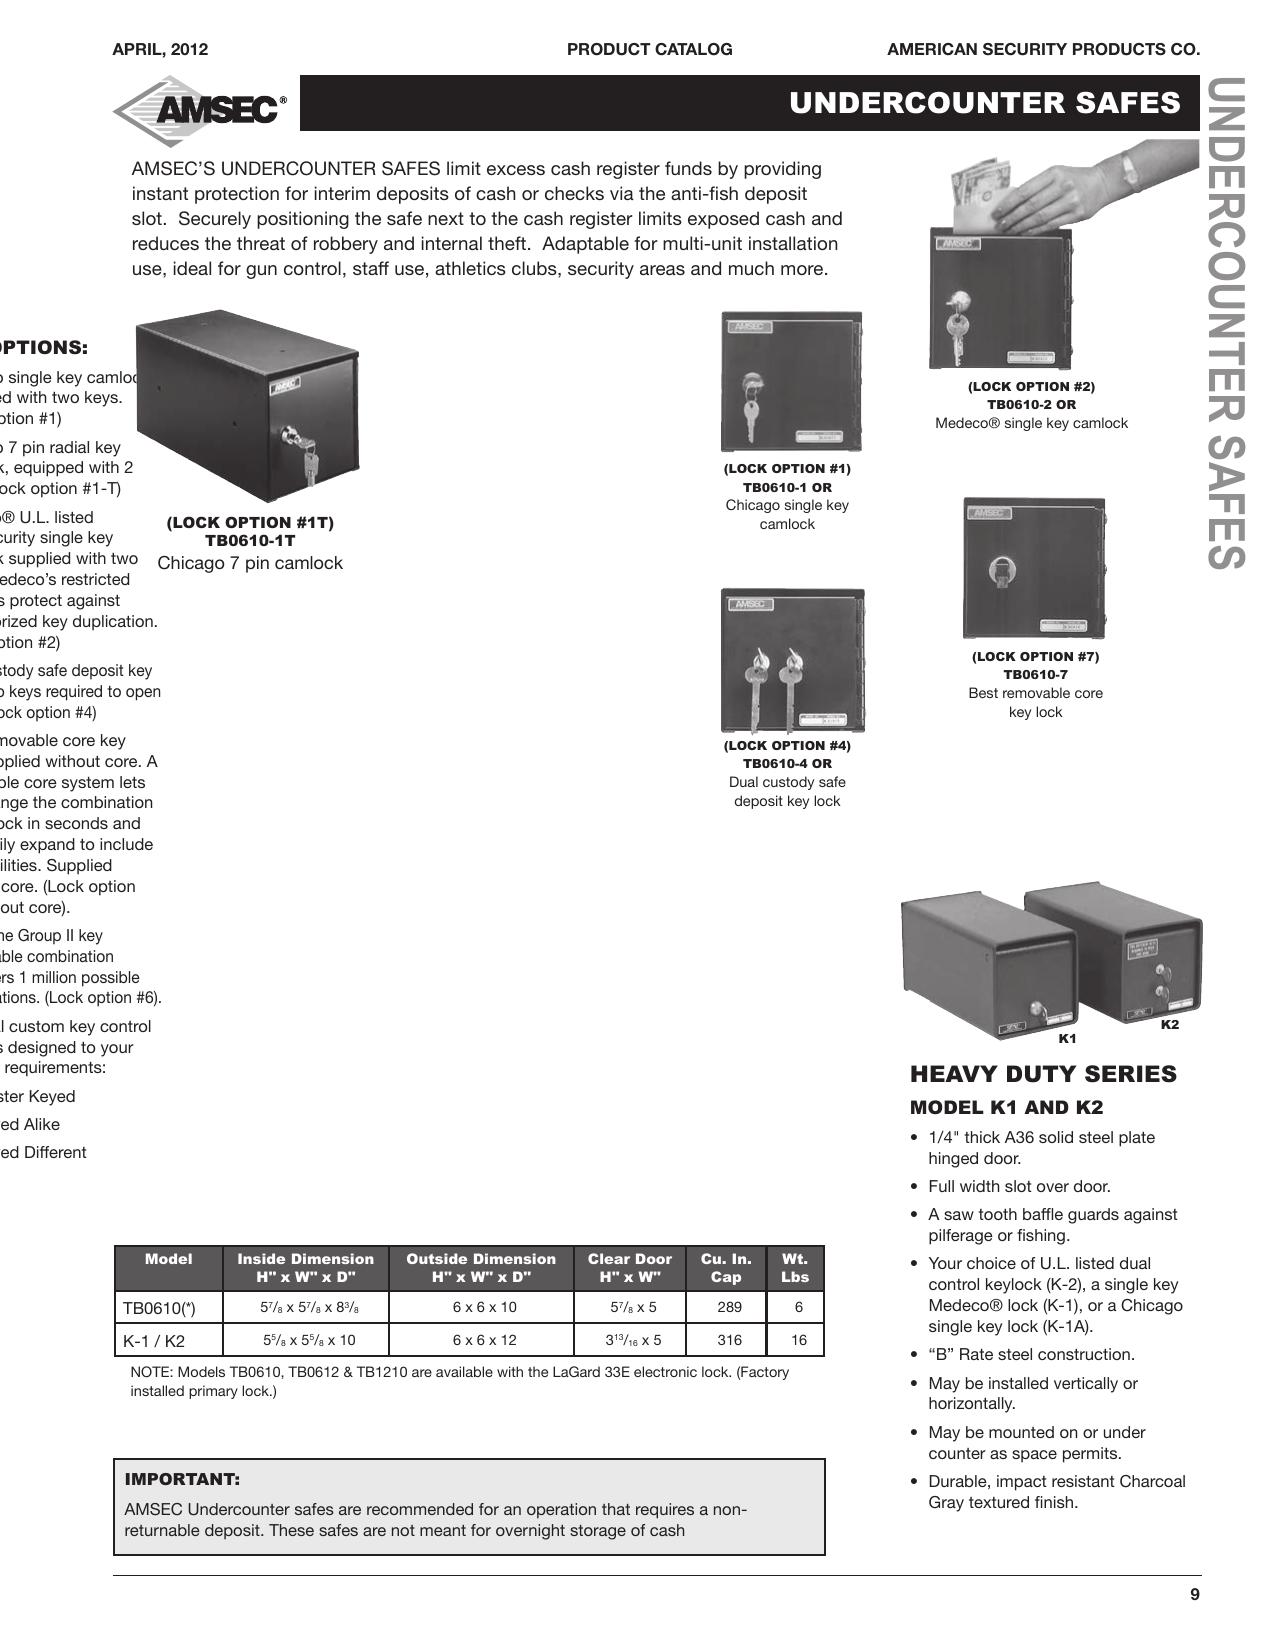 undercounter safes - Havens For Total Security Fresno CA | manualzz com